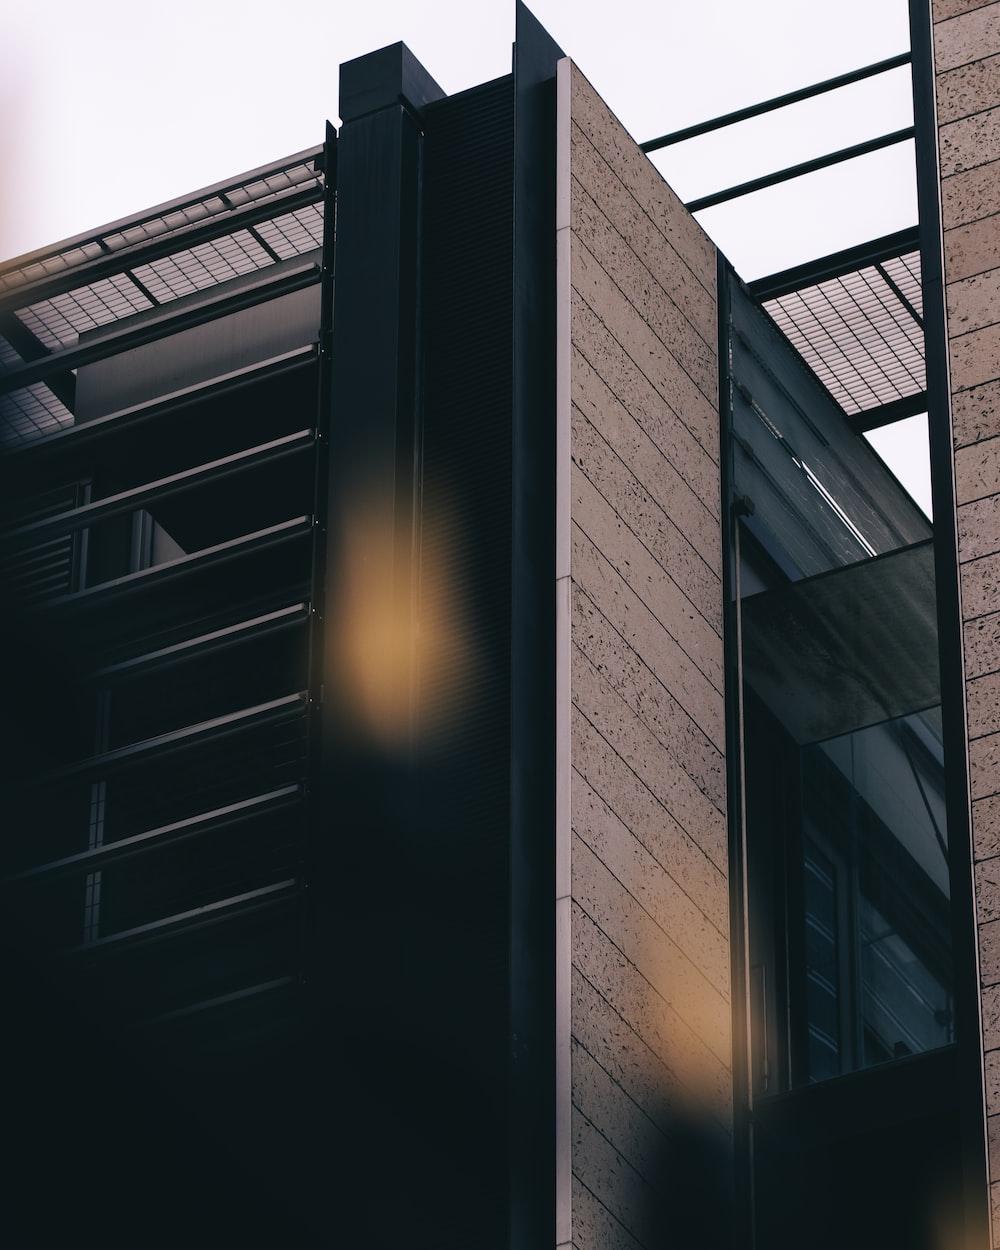 black and brown brick building